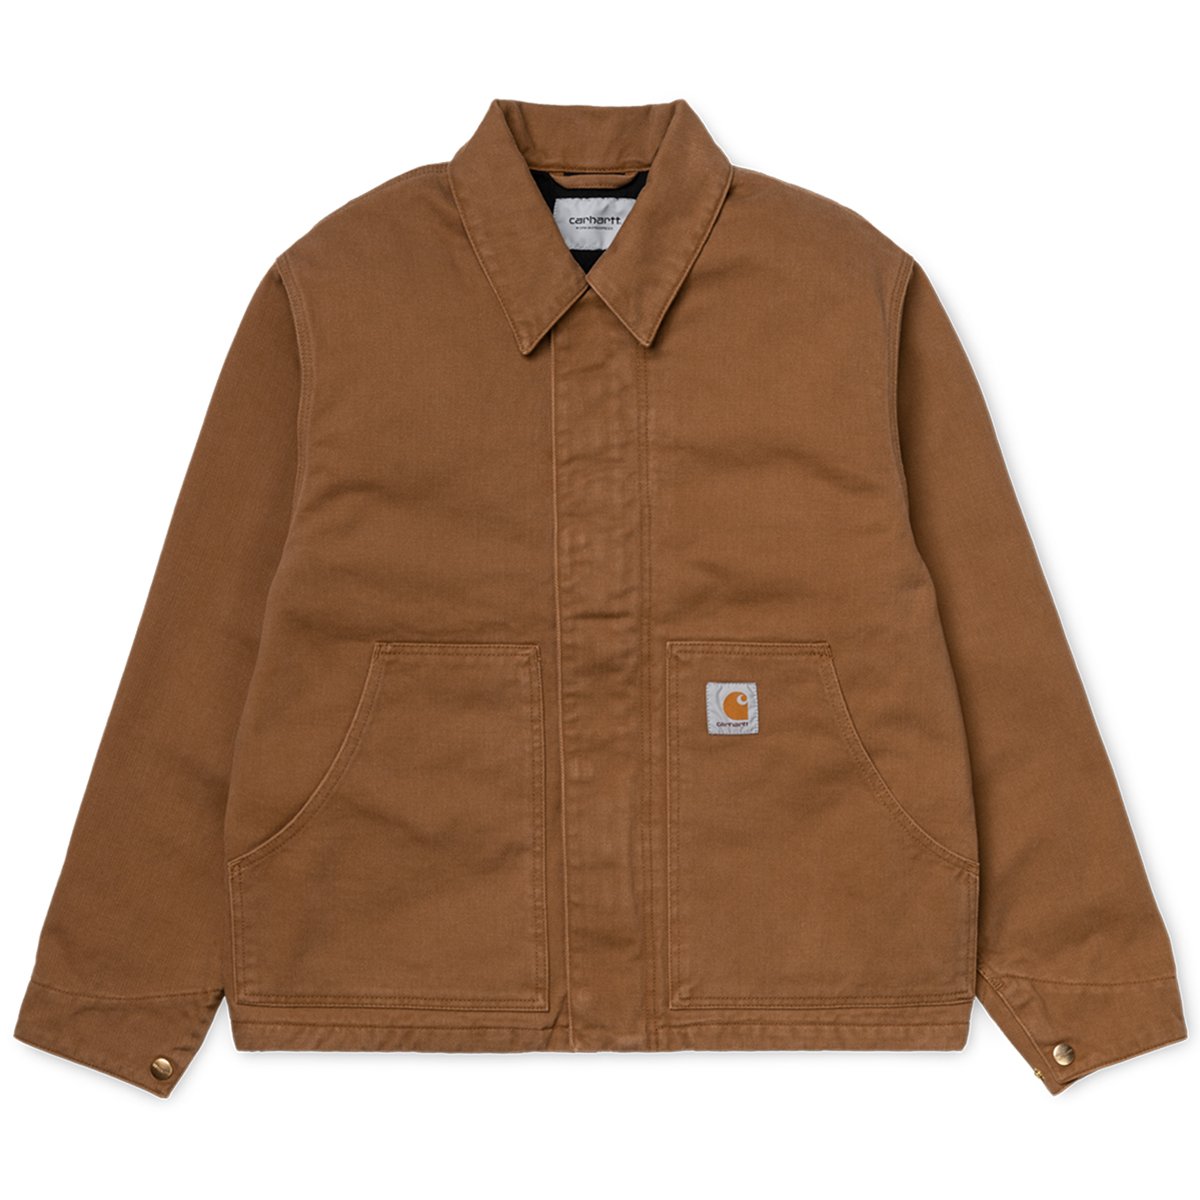 Arcan Jacket